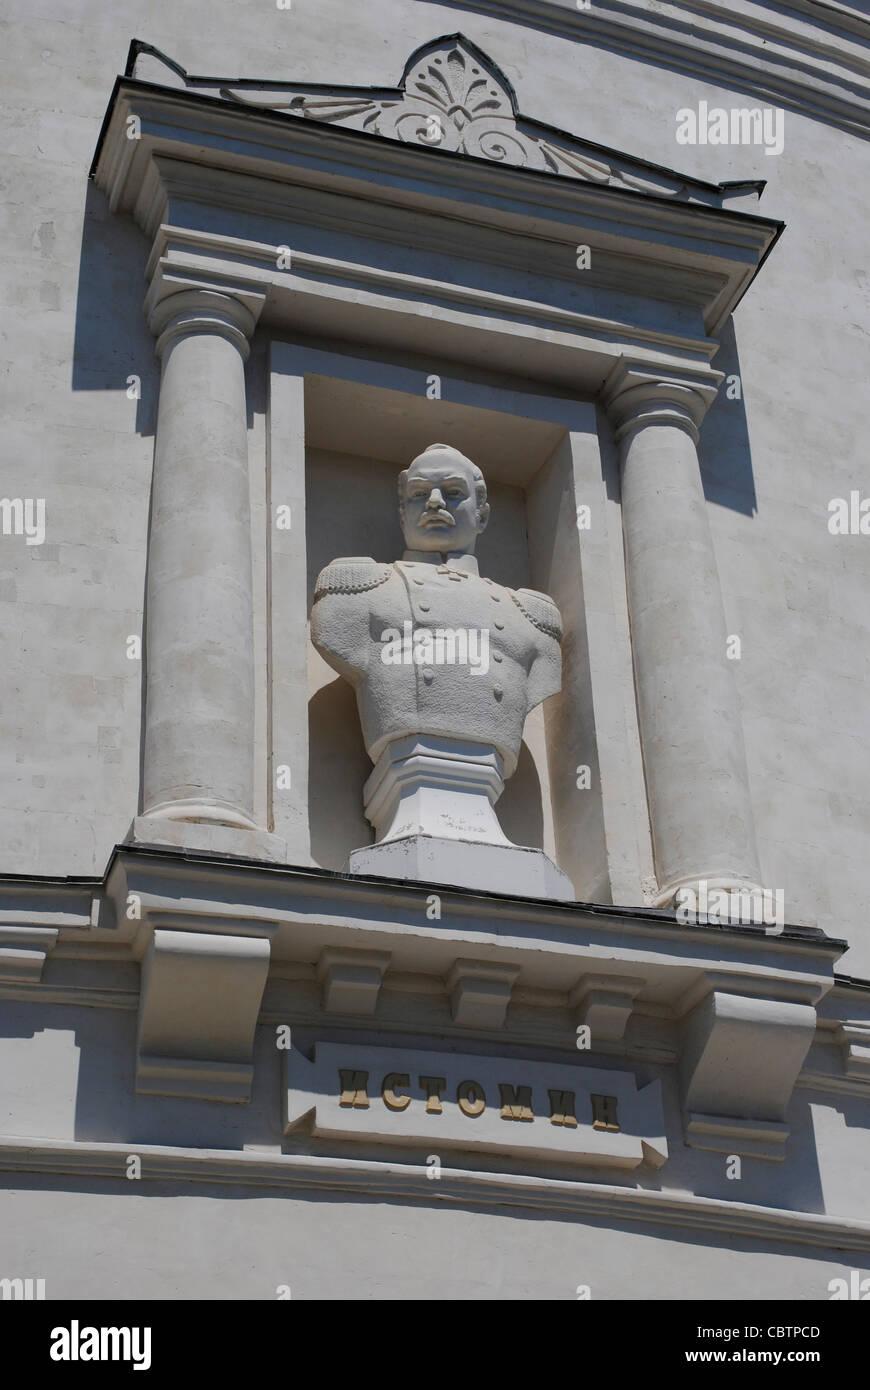 Ukraine. Sevastopol. The Museum of Heroic Defense and Liberation of Sevastopol. Bust of  Vladimir Ivanovich Istomin - Stock Image